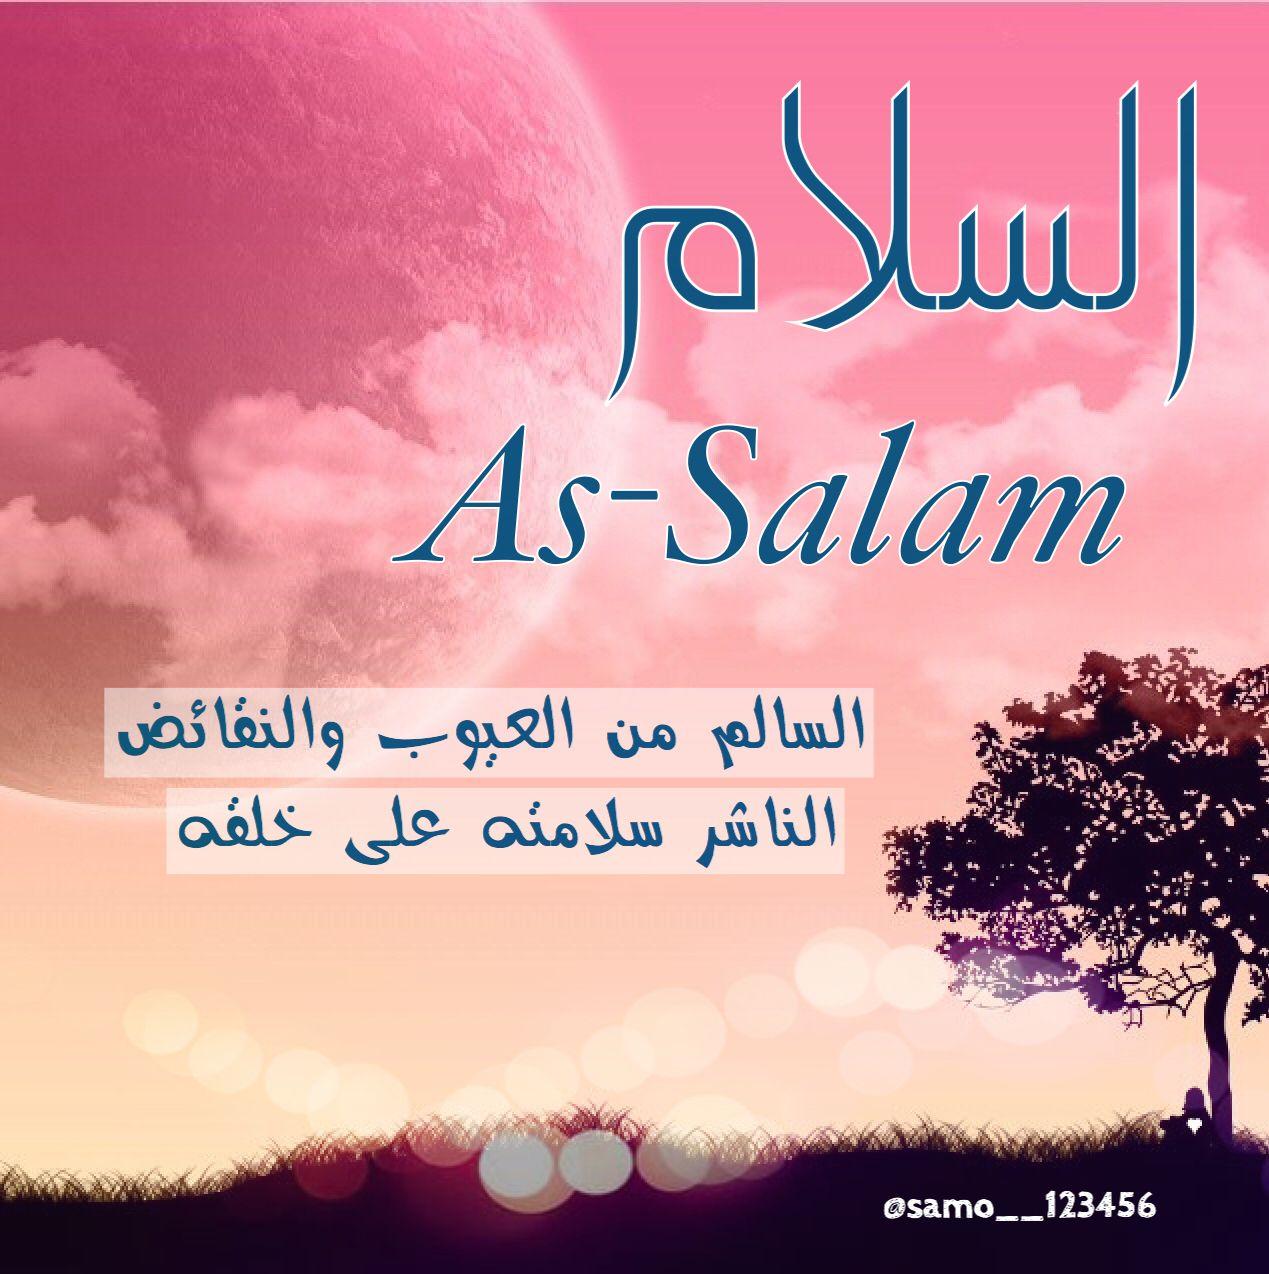 معاني اسماء الله الحسنى Beautiful Names Of Allah Allah All About Islam